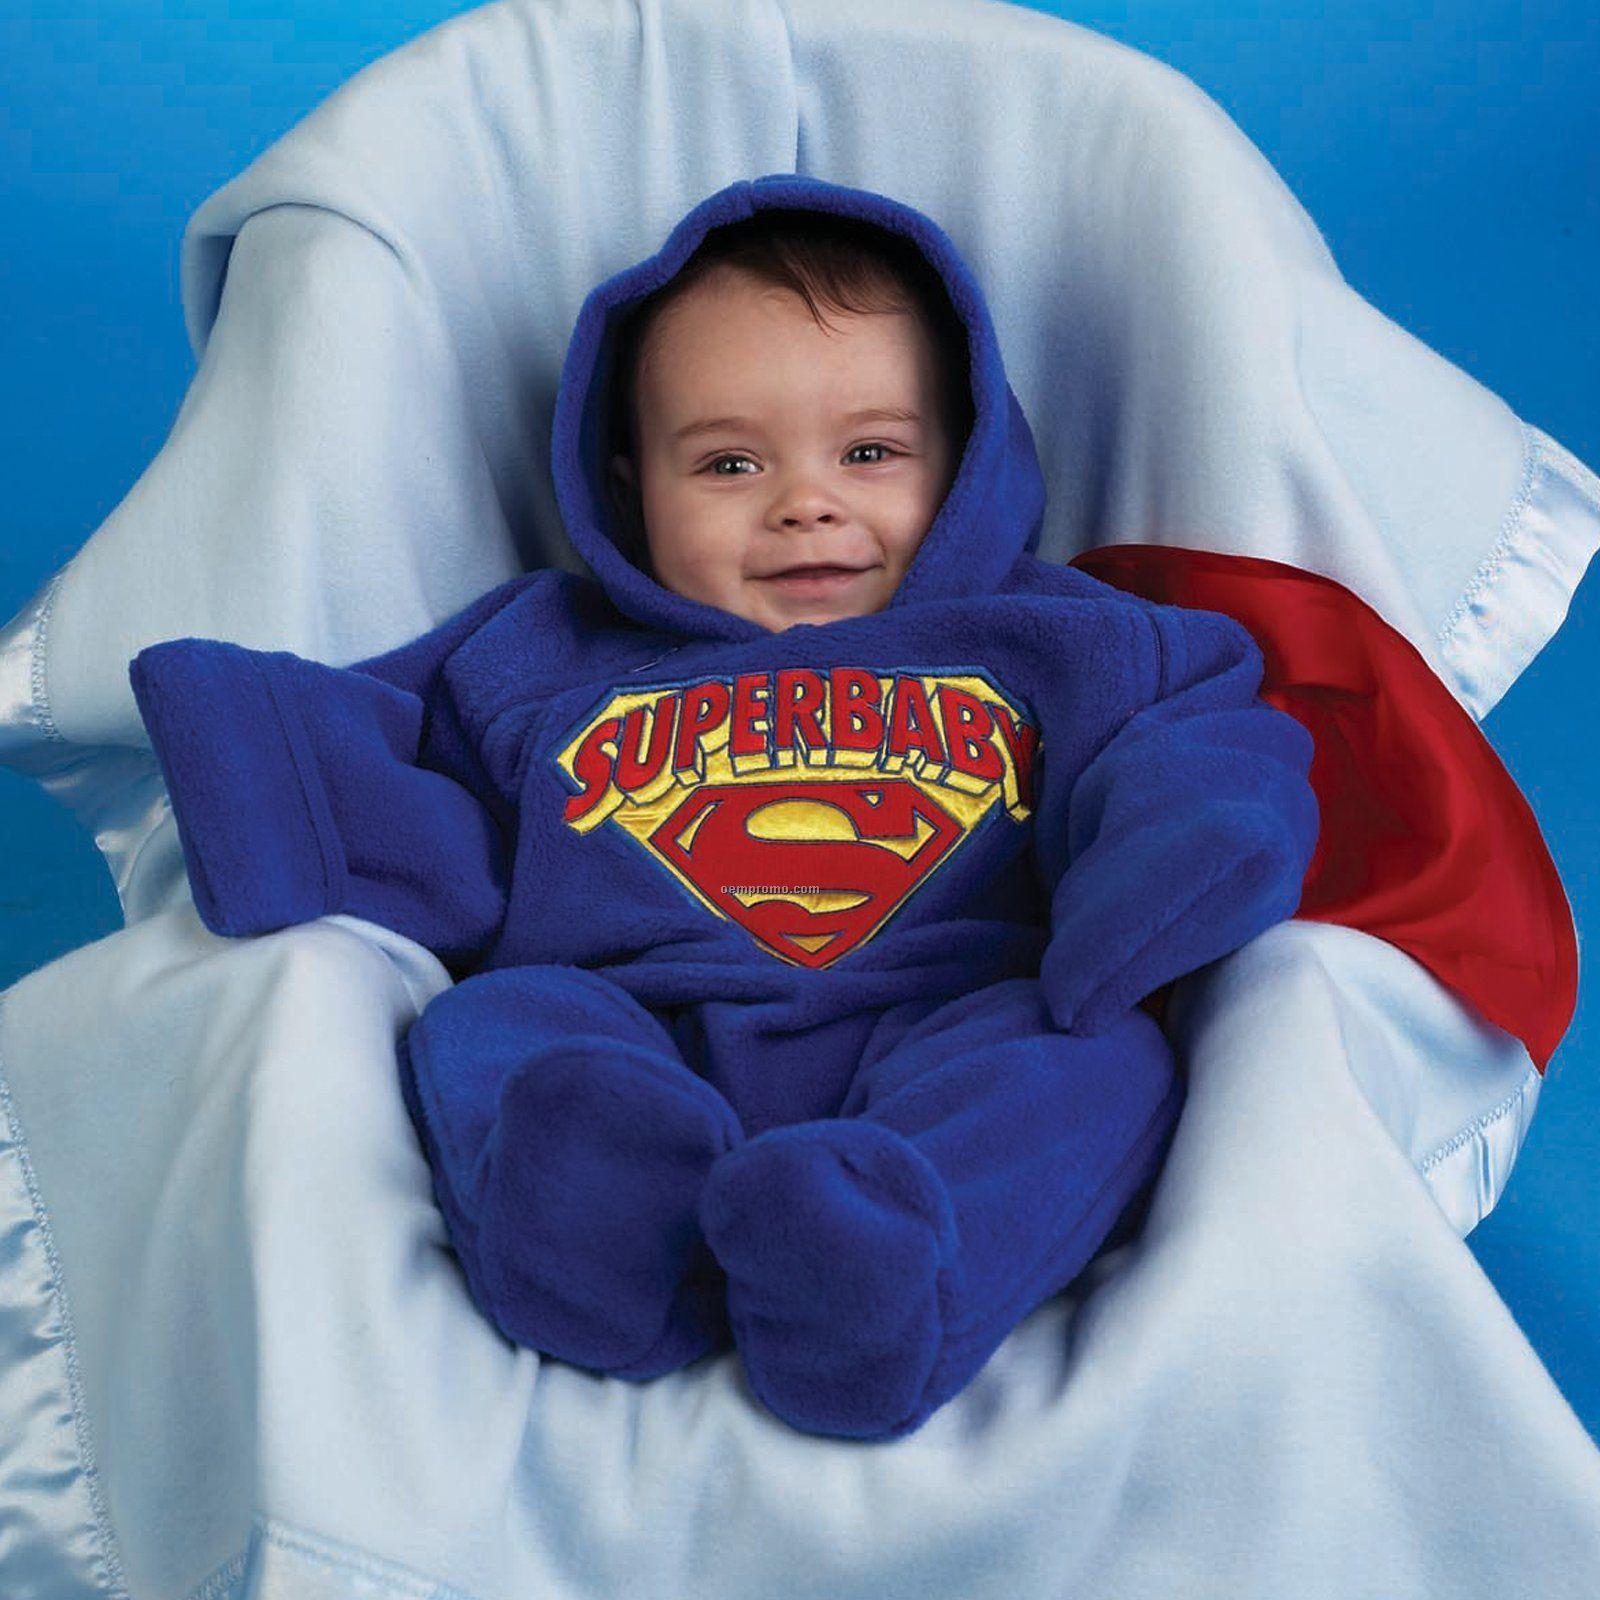 Polar Fleece Superbaby Infant Snow Suit